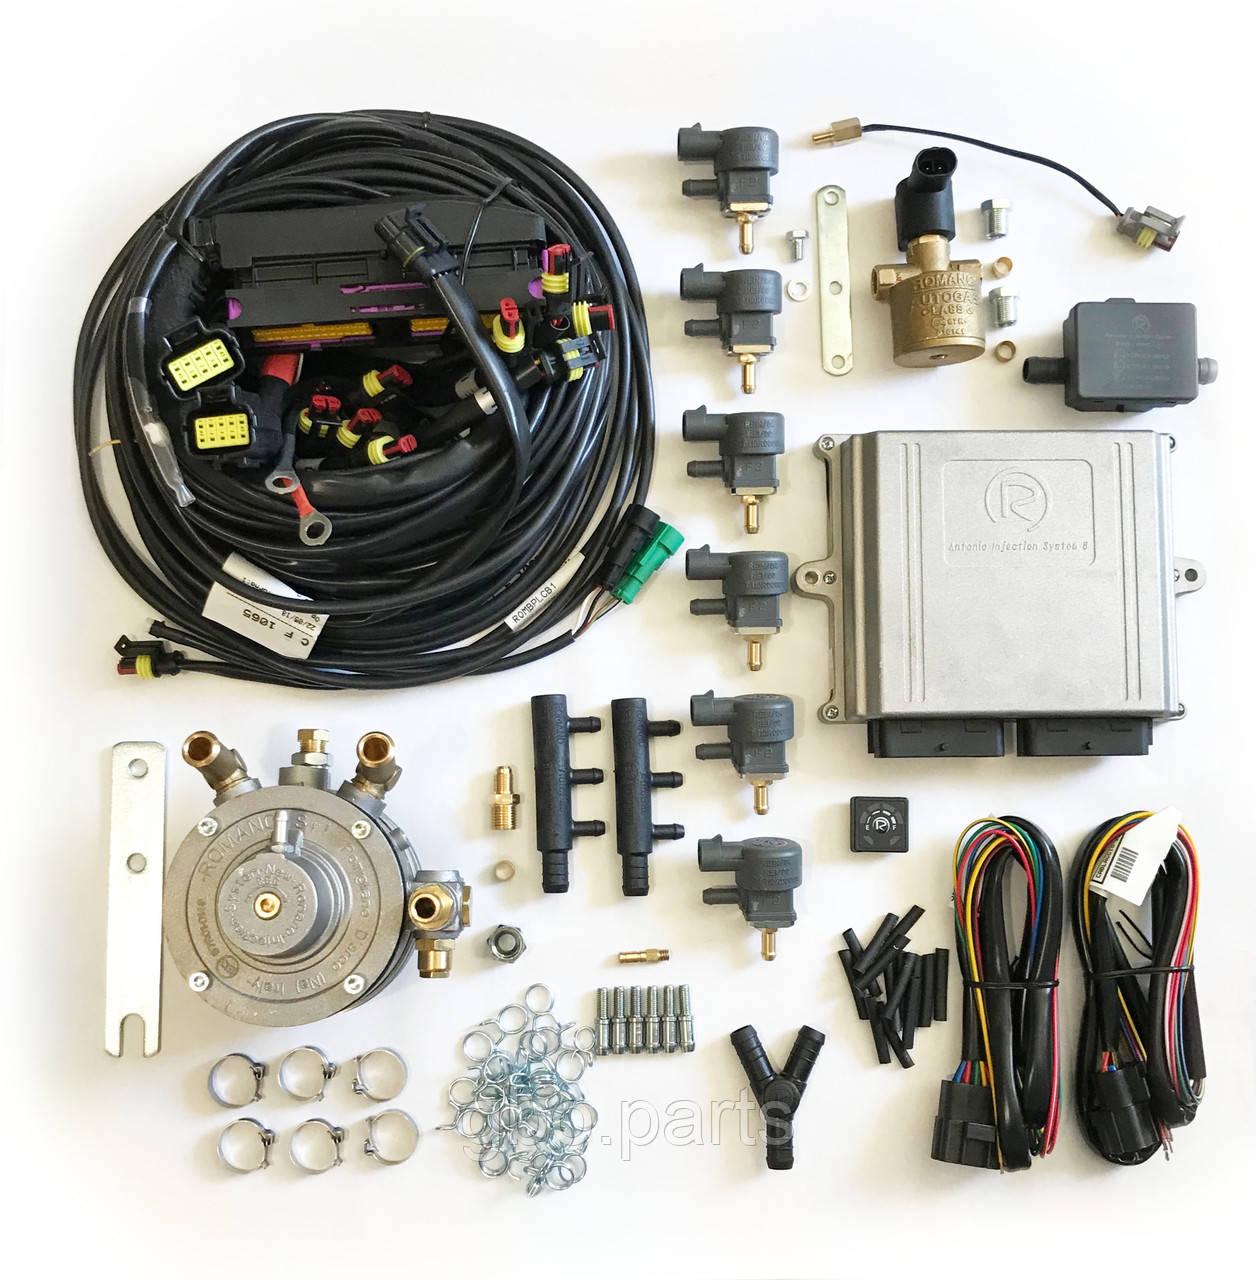 Комплект Romano OBD 290 кВт Direct injection/звичайний на 6 цил. (електроніка, редуктор, клапан, форсунки)